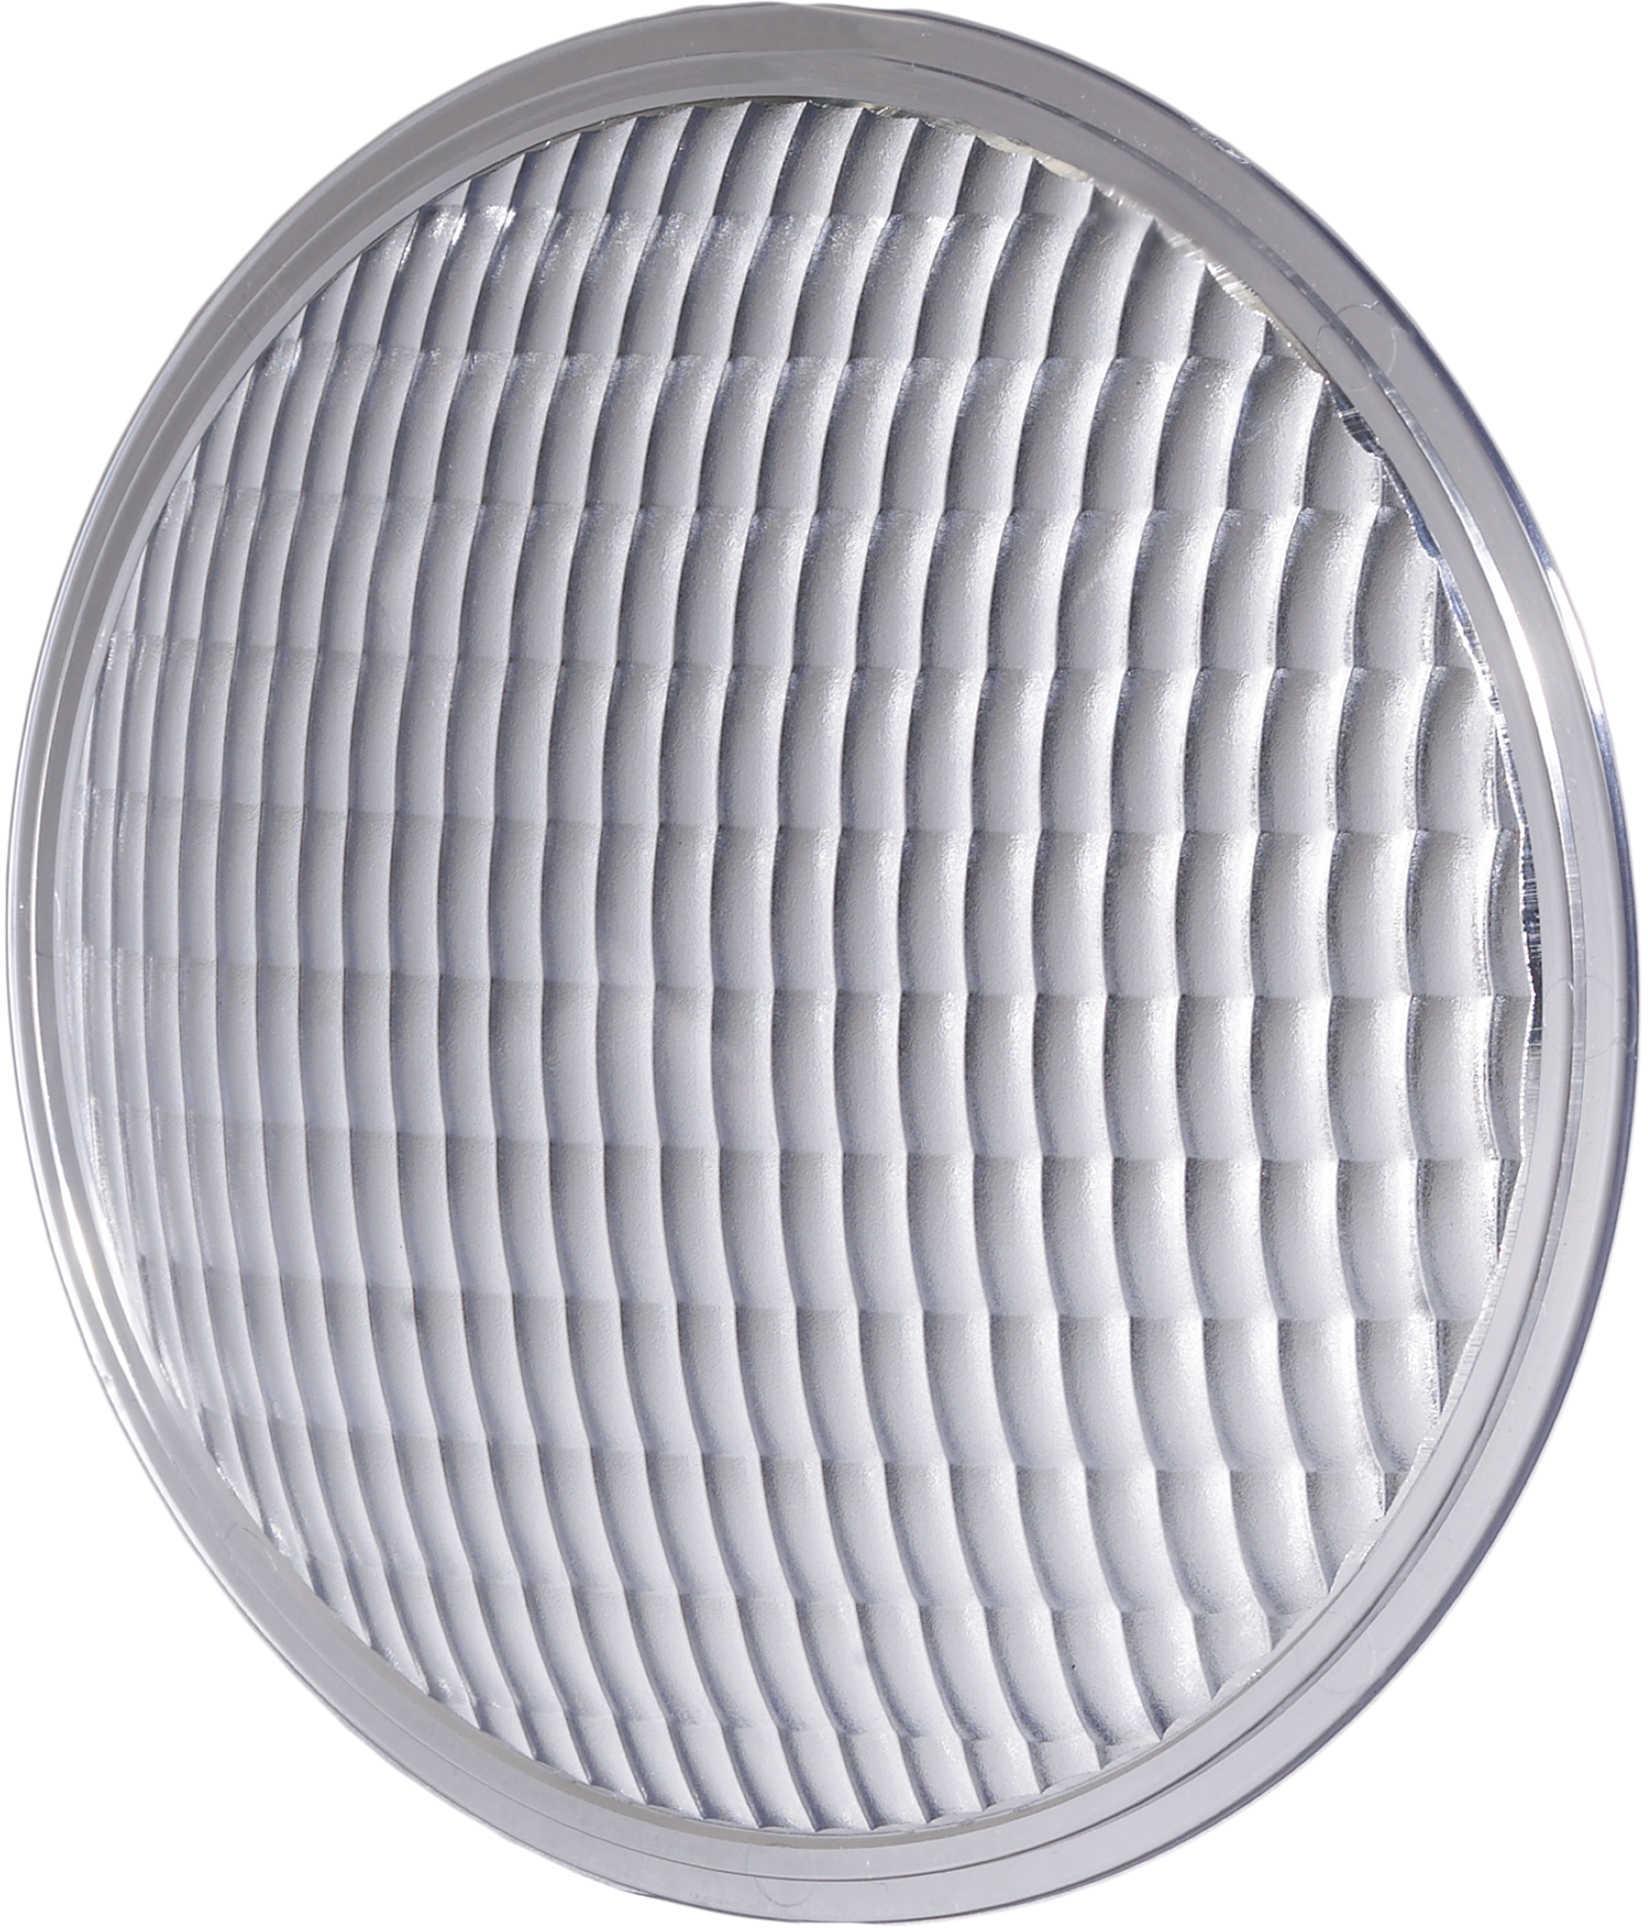 Streamlight Hid Flood Lens Md: 45657